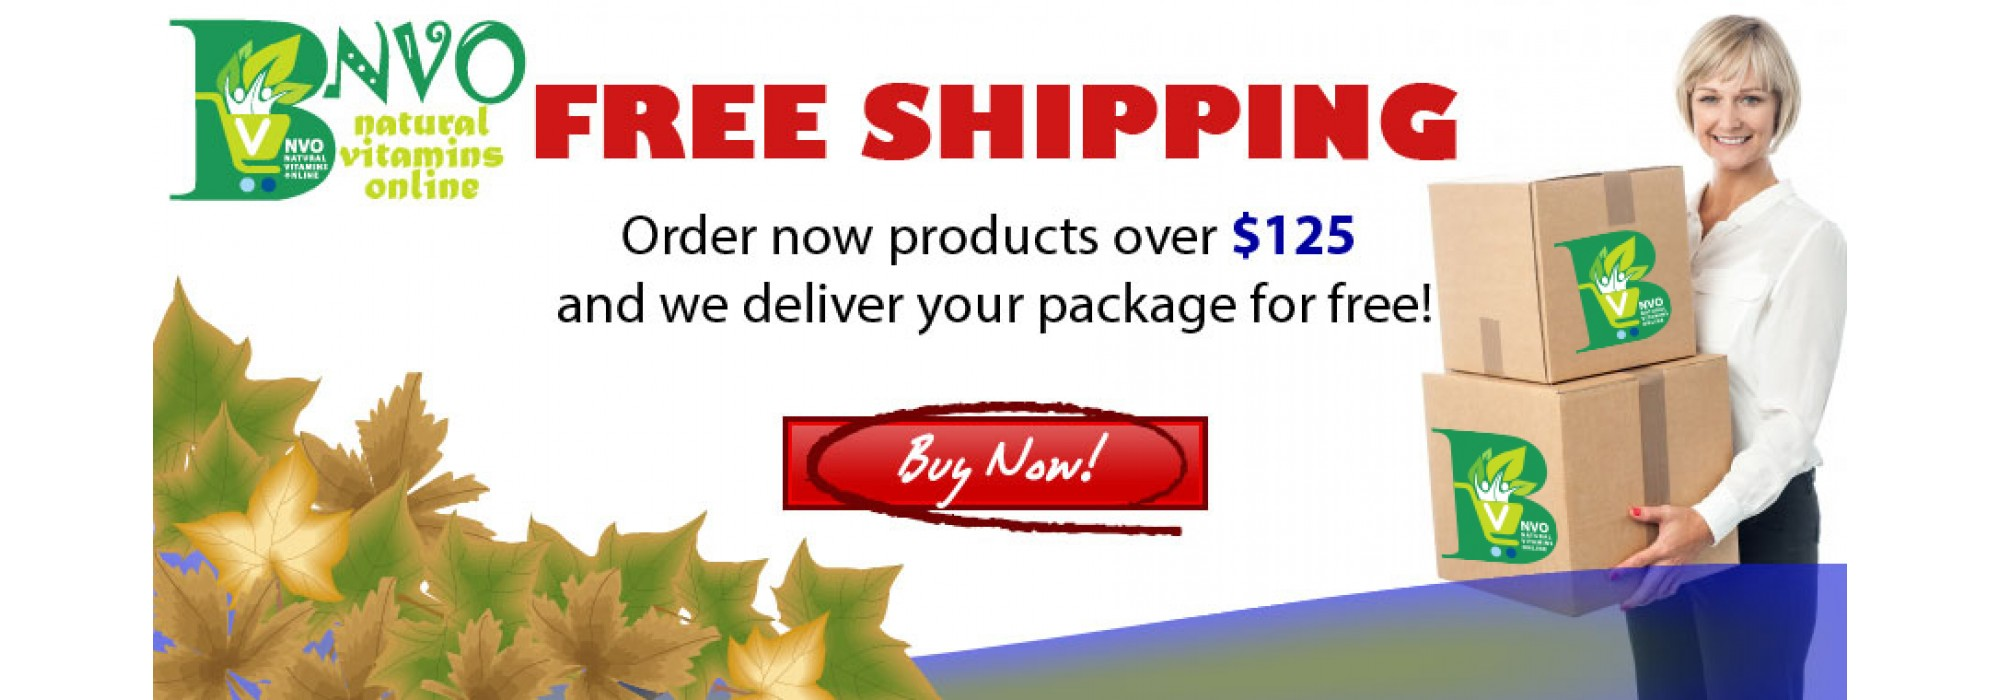 NVO Free Shipping